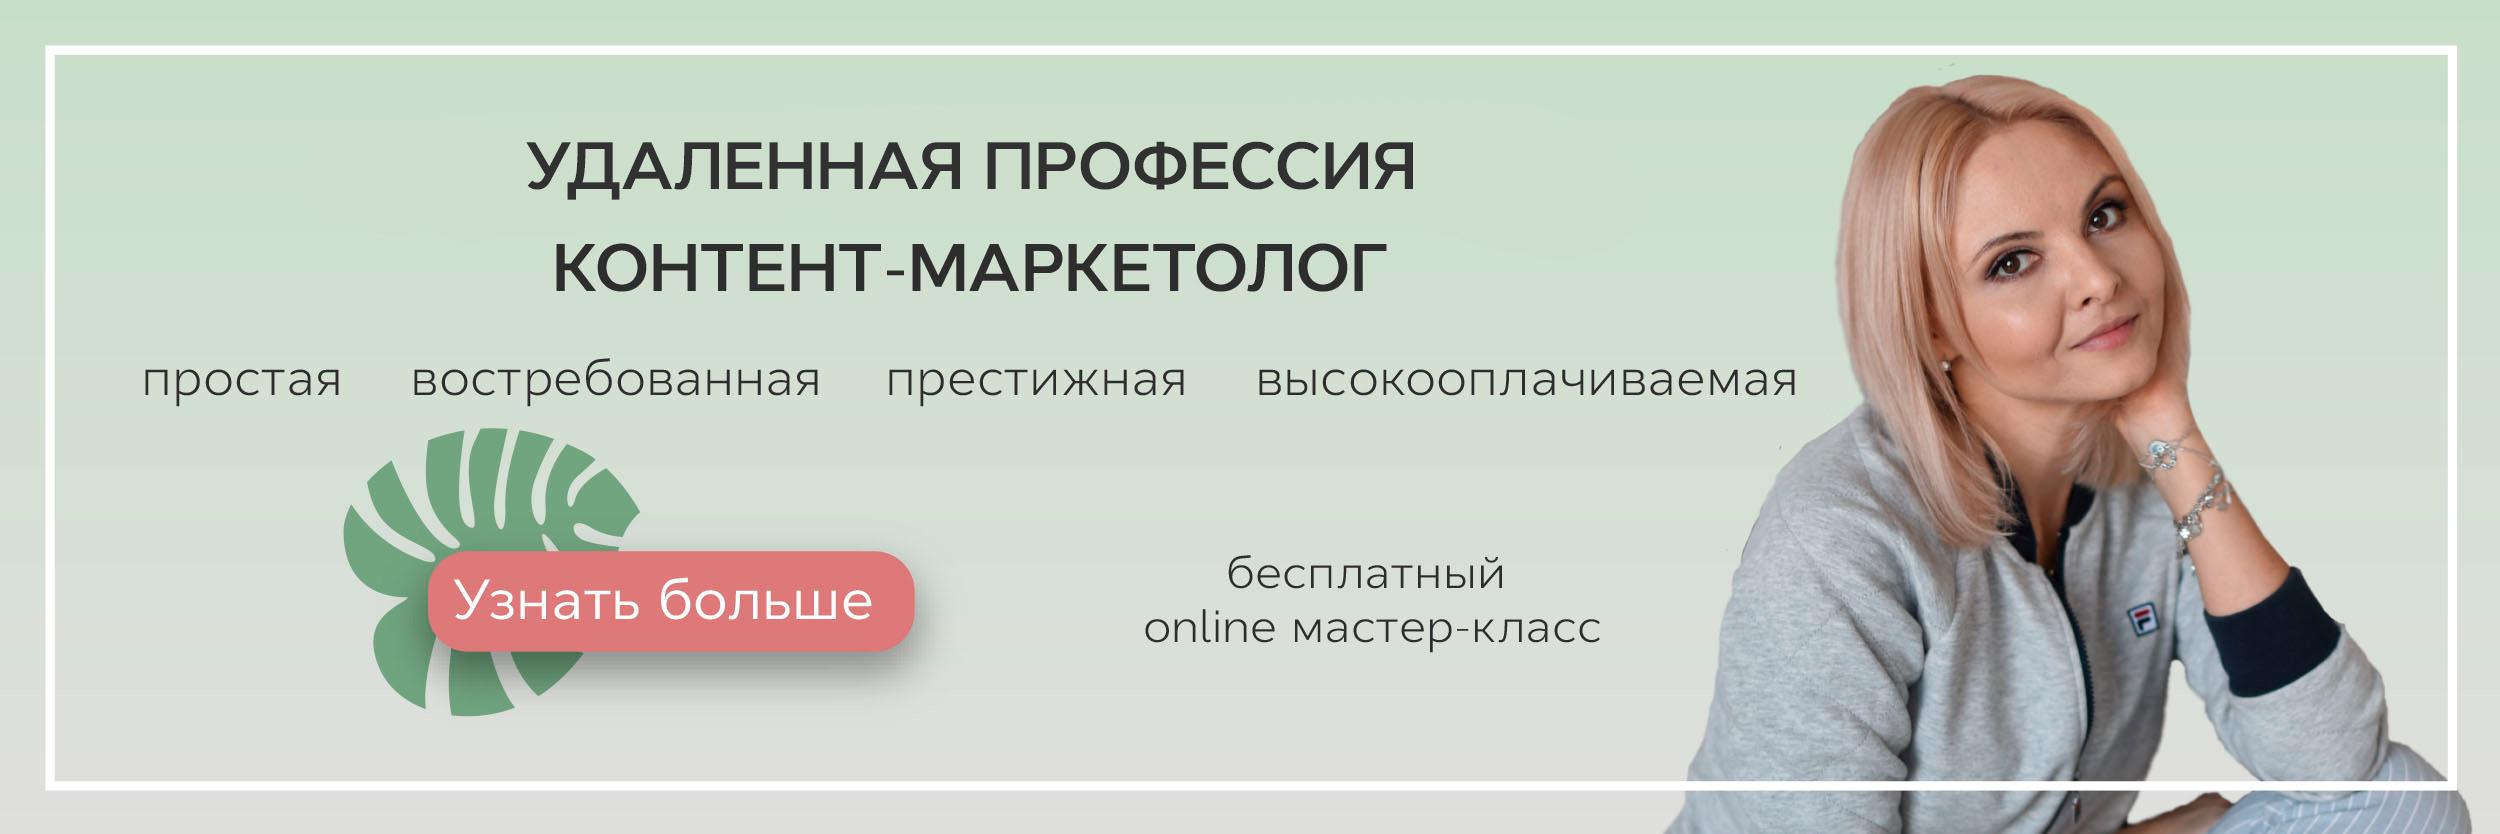 Бесплатный онлайн мастер-класс